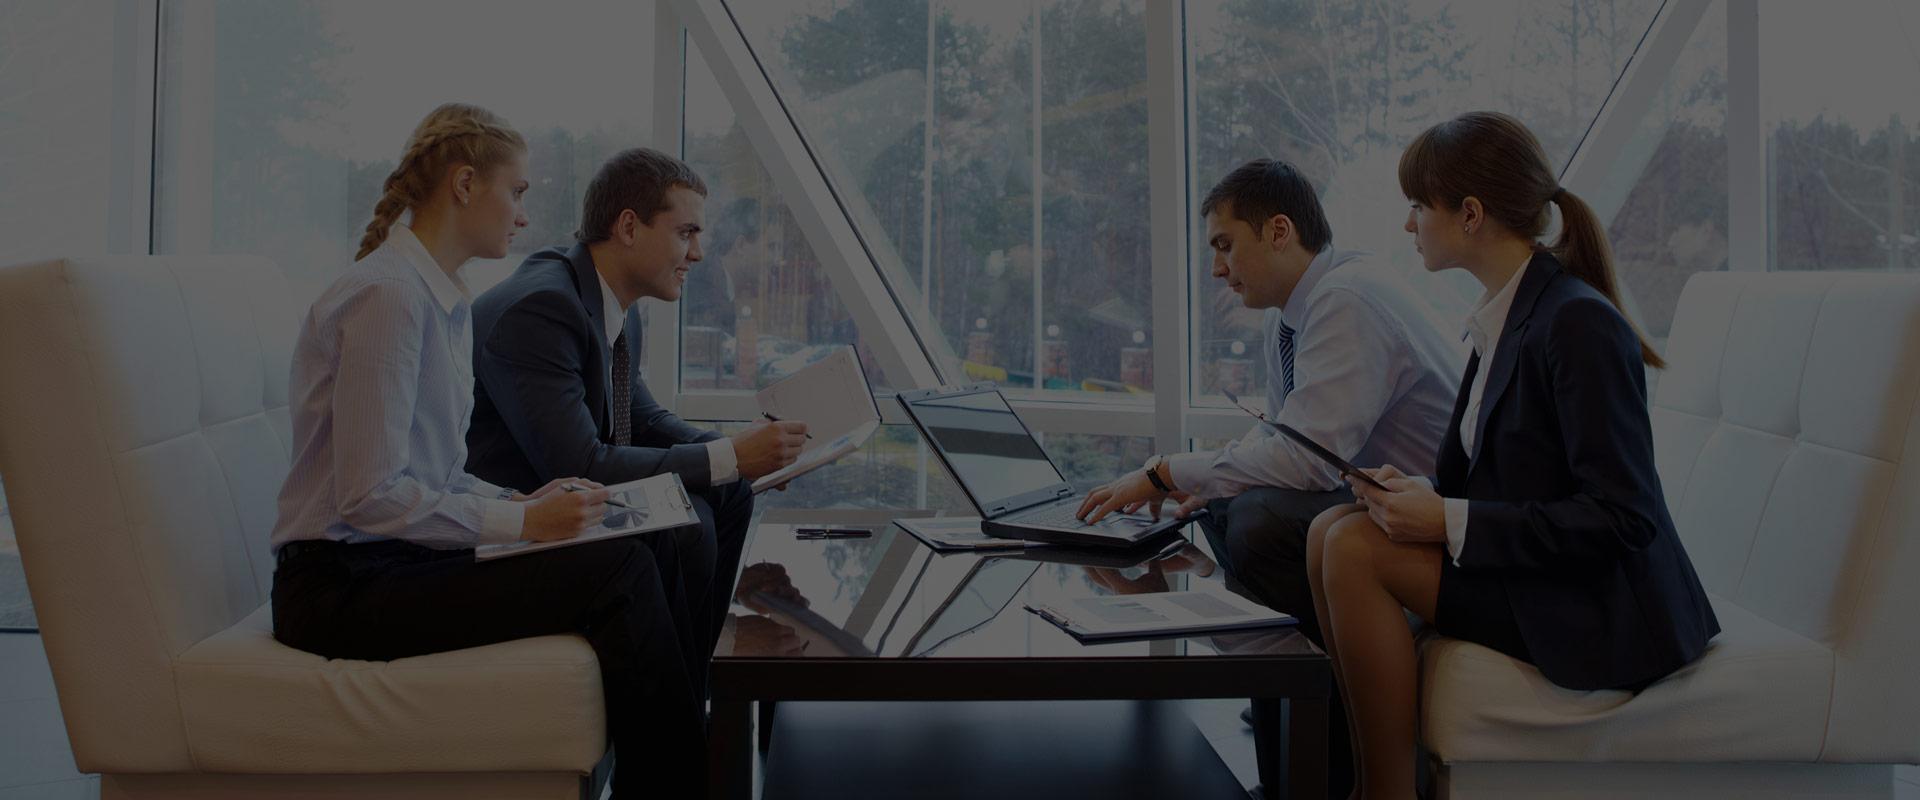 Business litigation facts Greene, Broillet & Wheeler, LLP